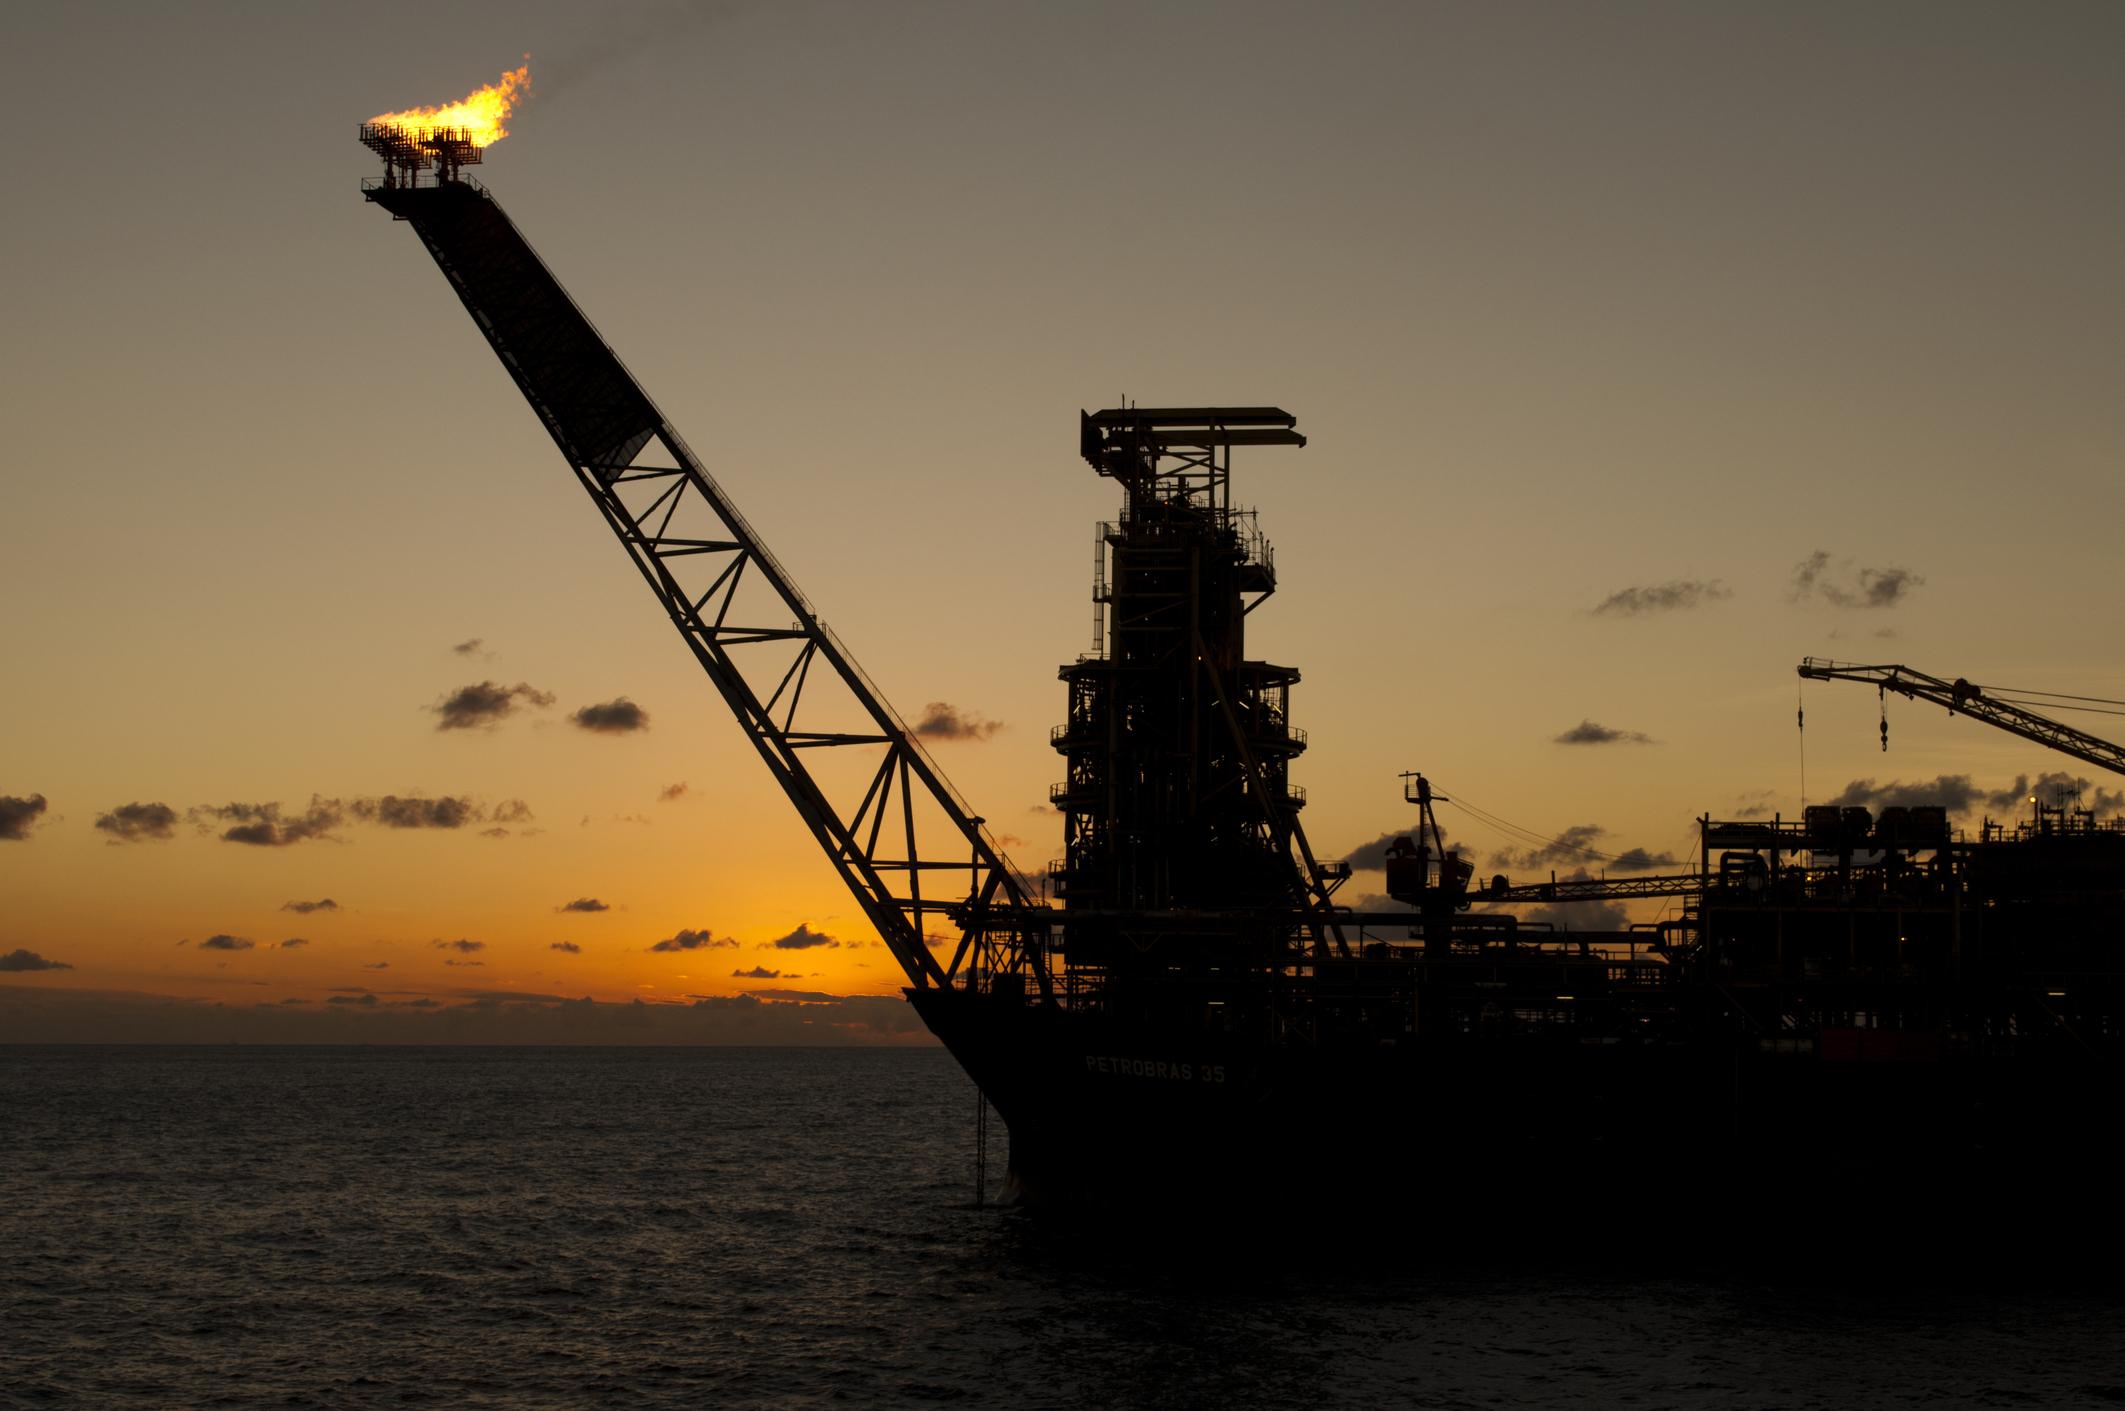 Offshore production platform at sunset.